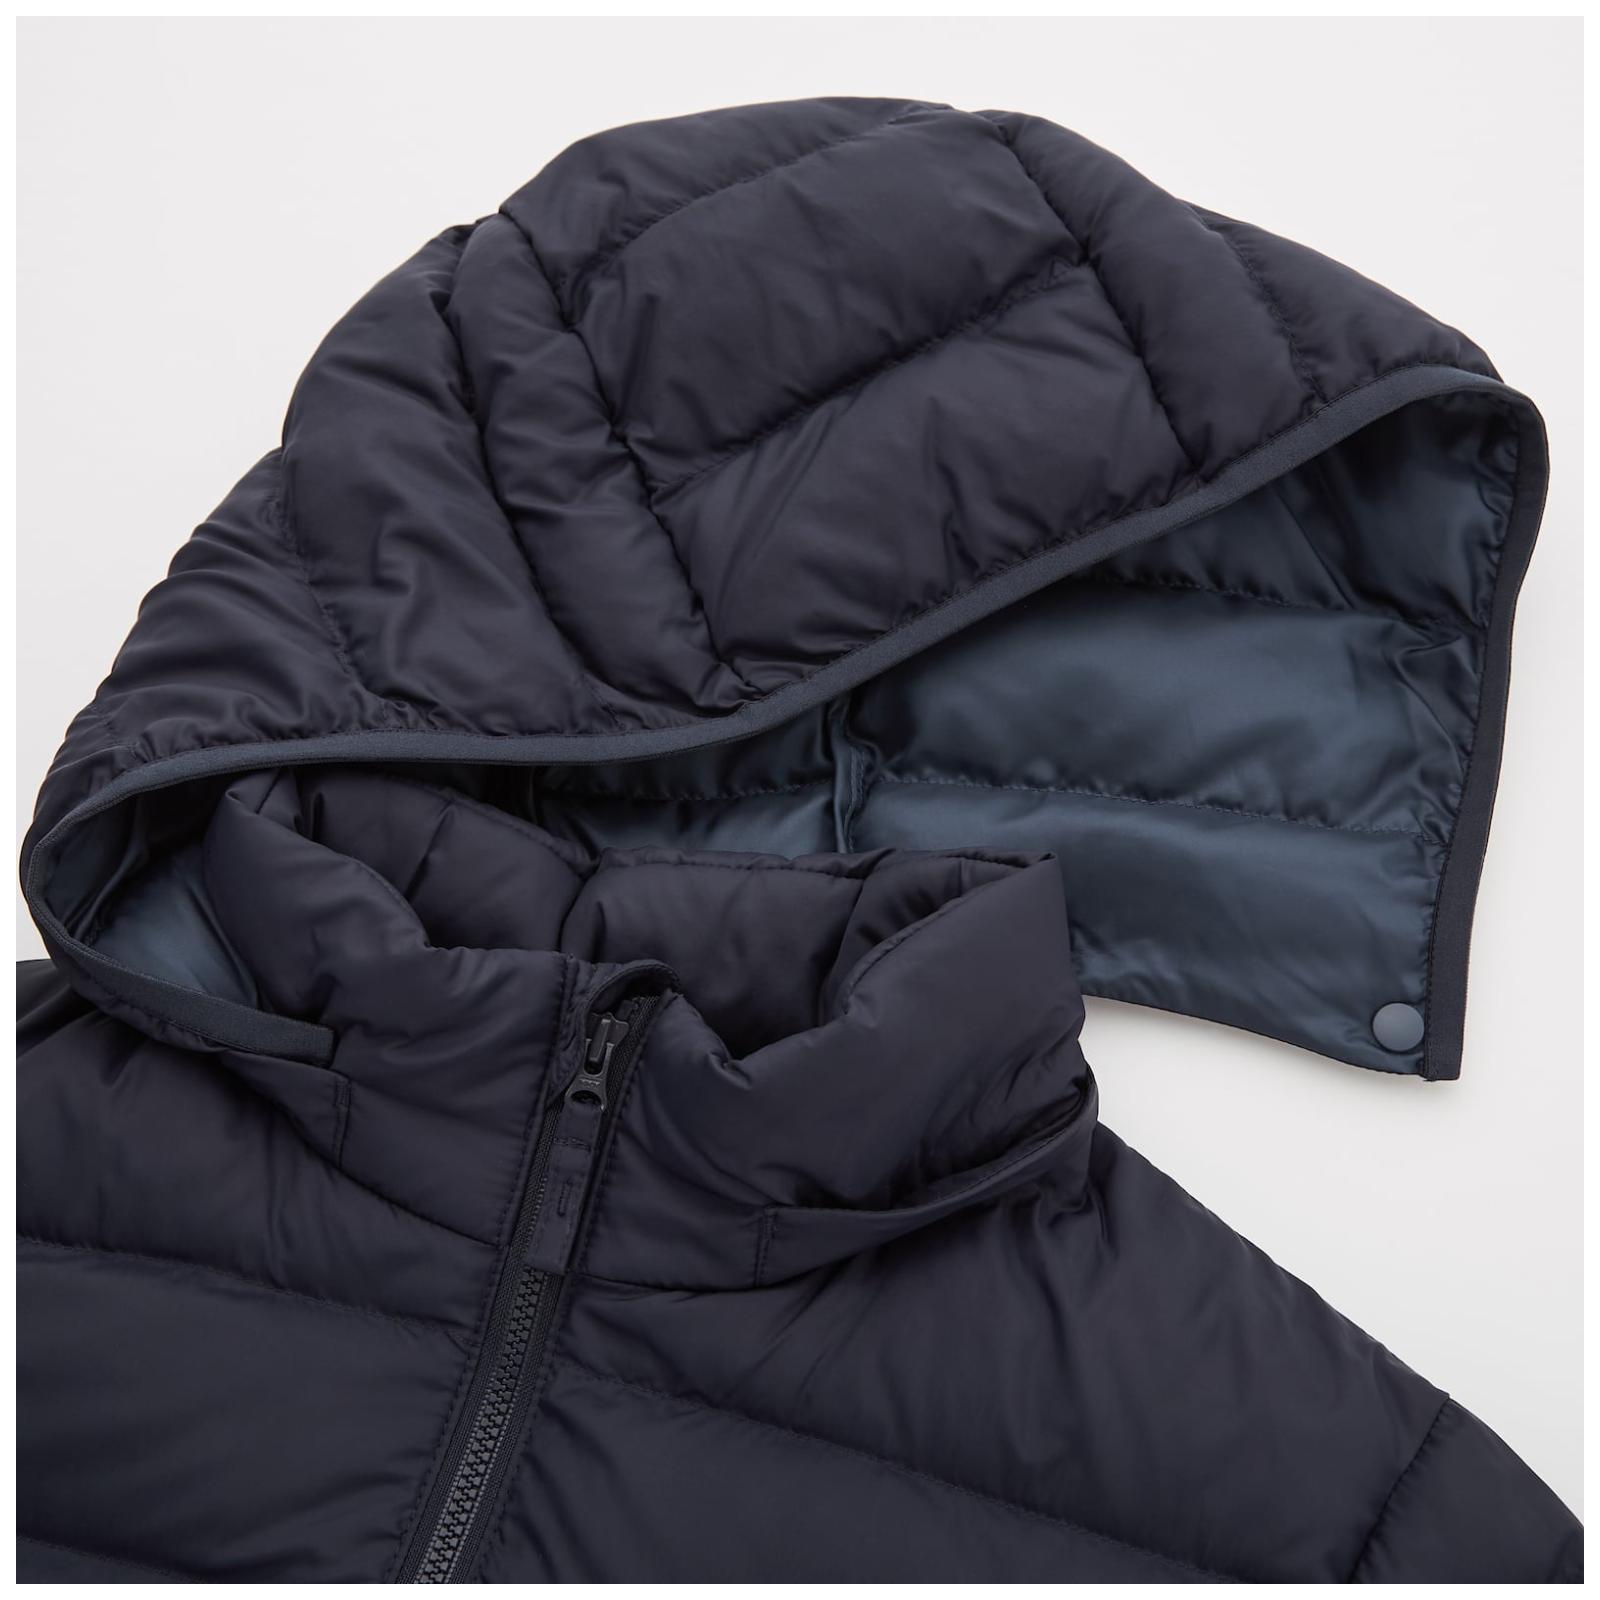 Jaqueta de Inverno Uniqlo Preta - 7-8 anos Unissex